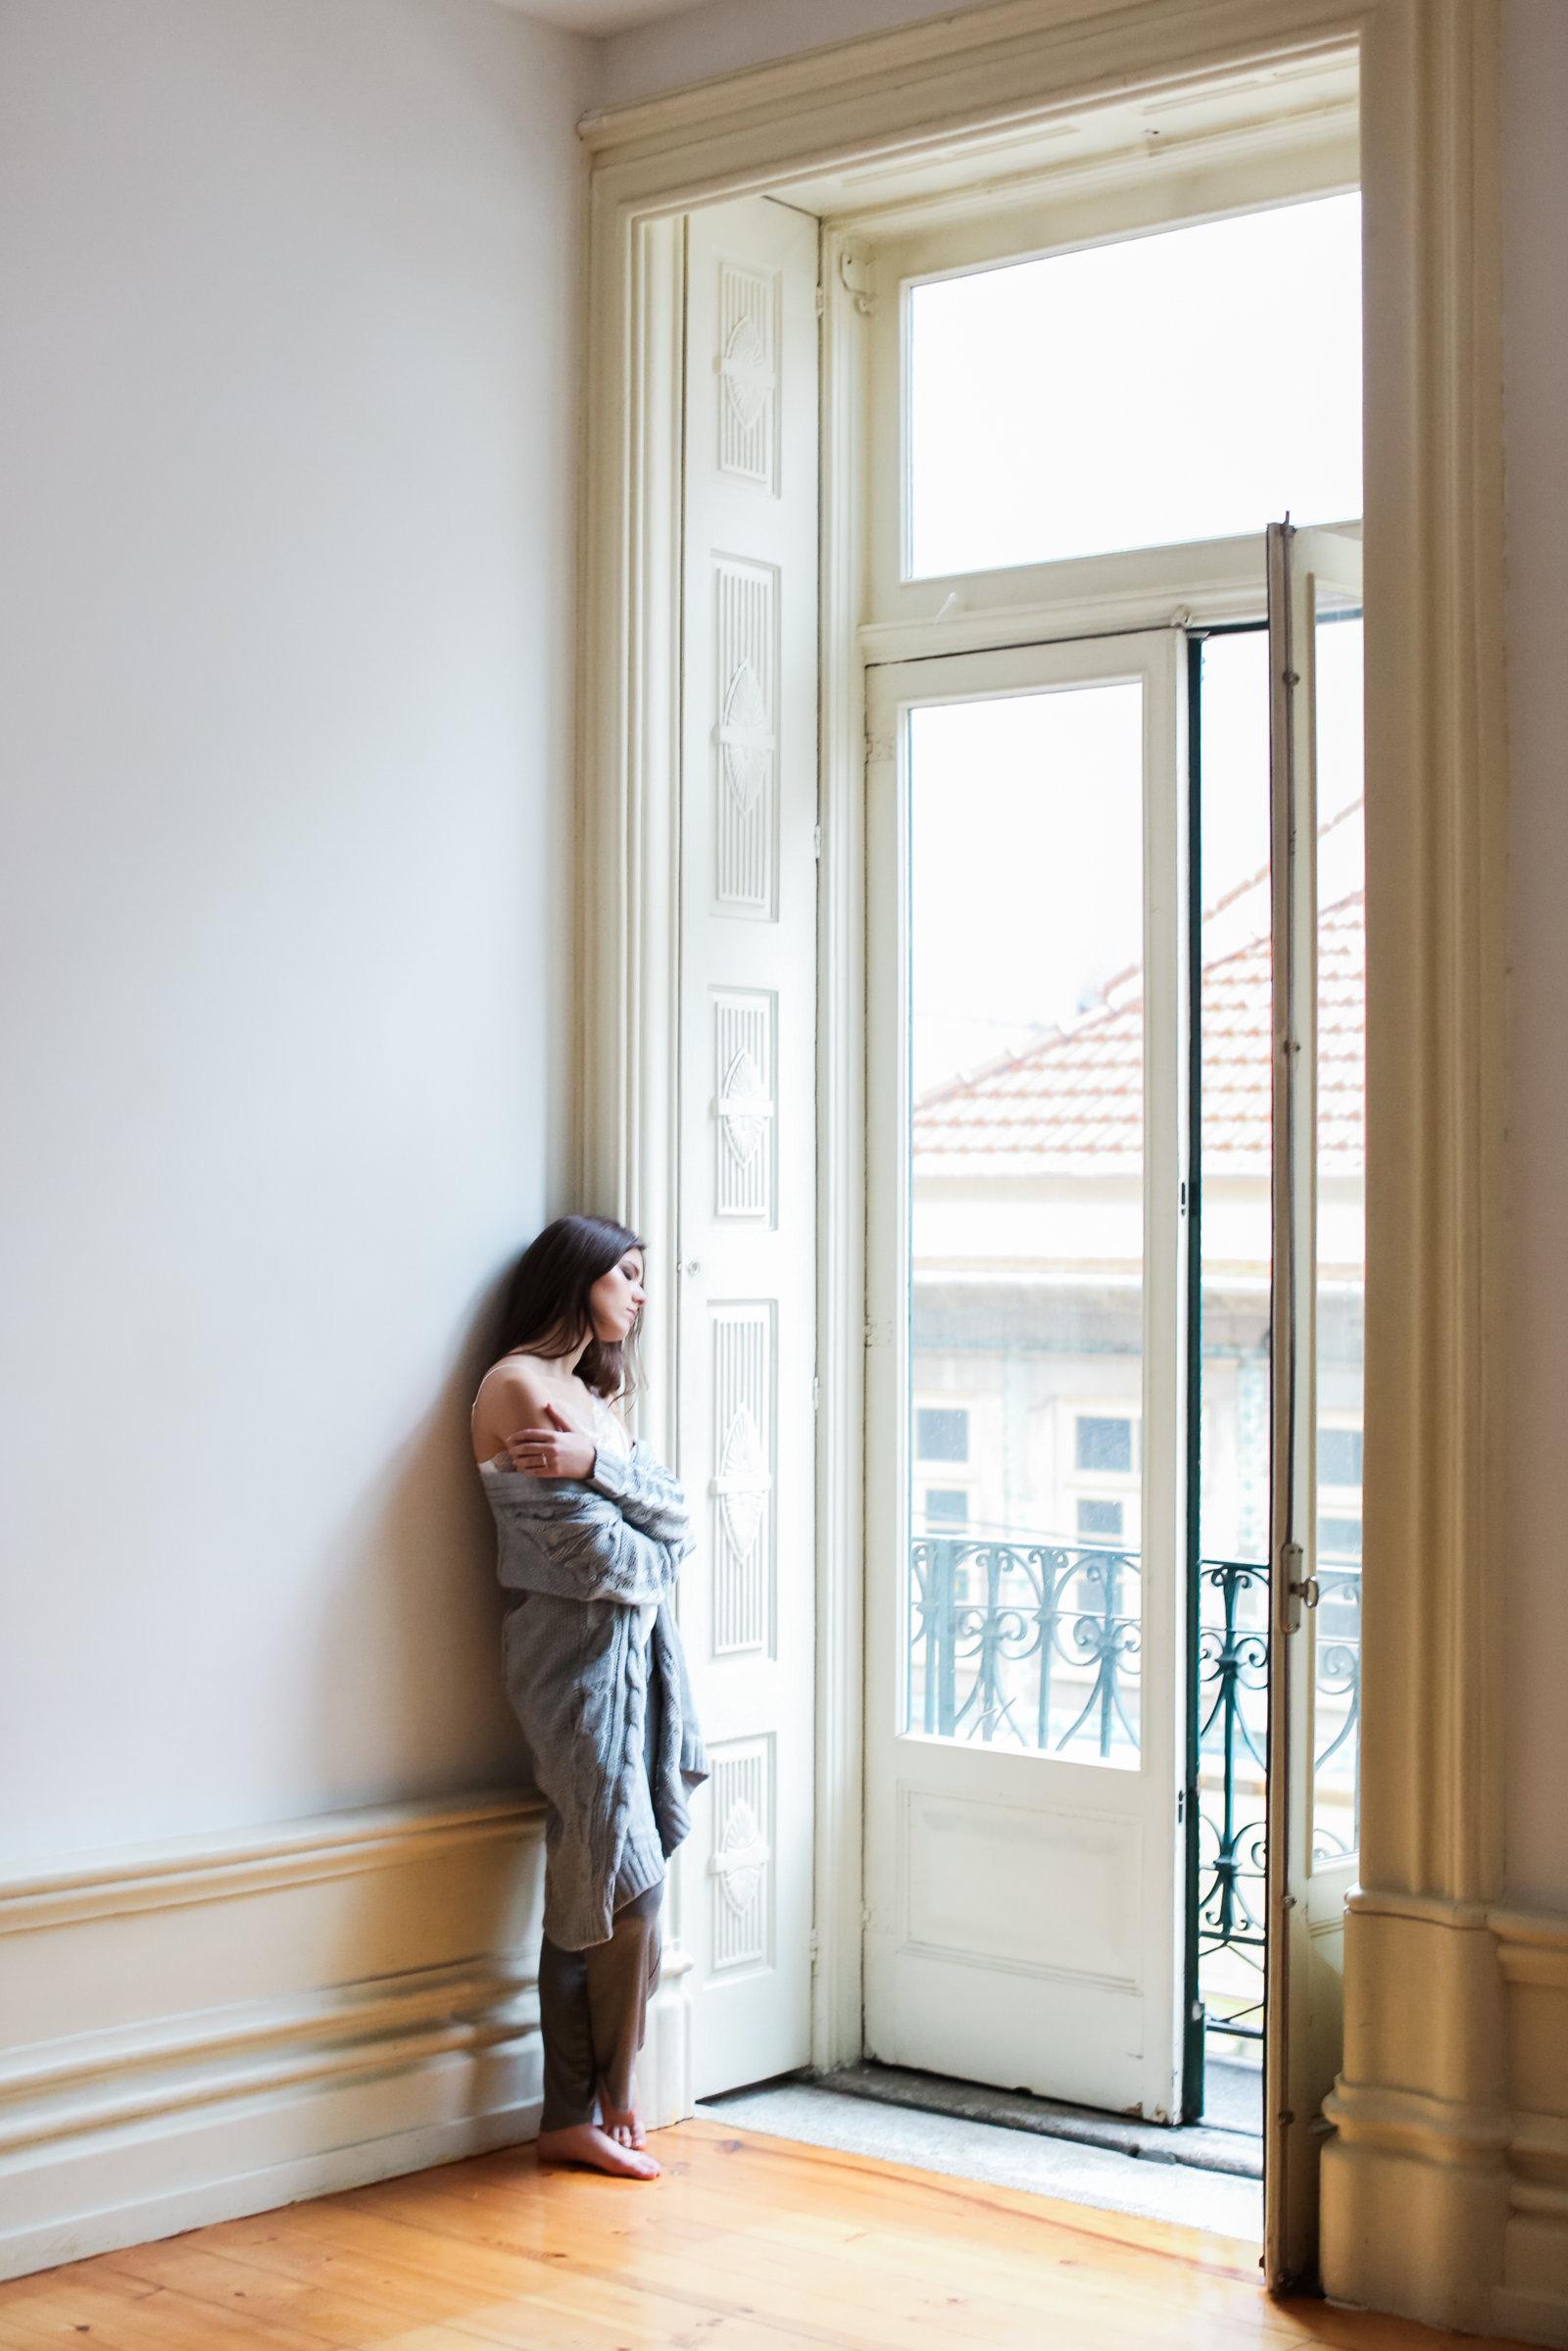 mariarao photography-branco prata-one to one-22 web.jpg